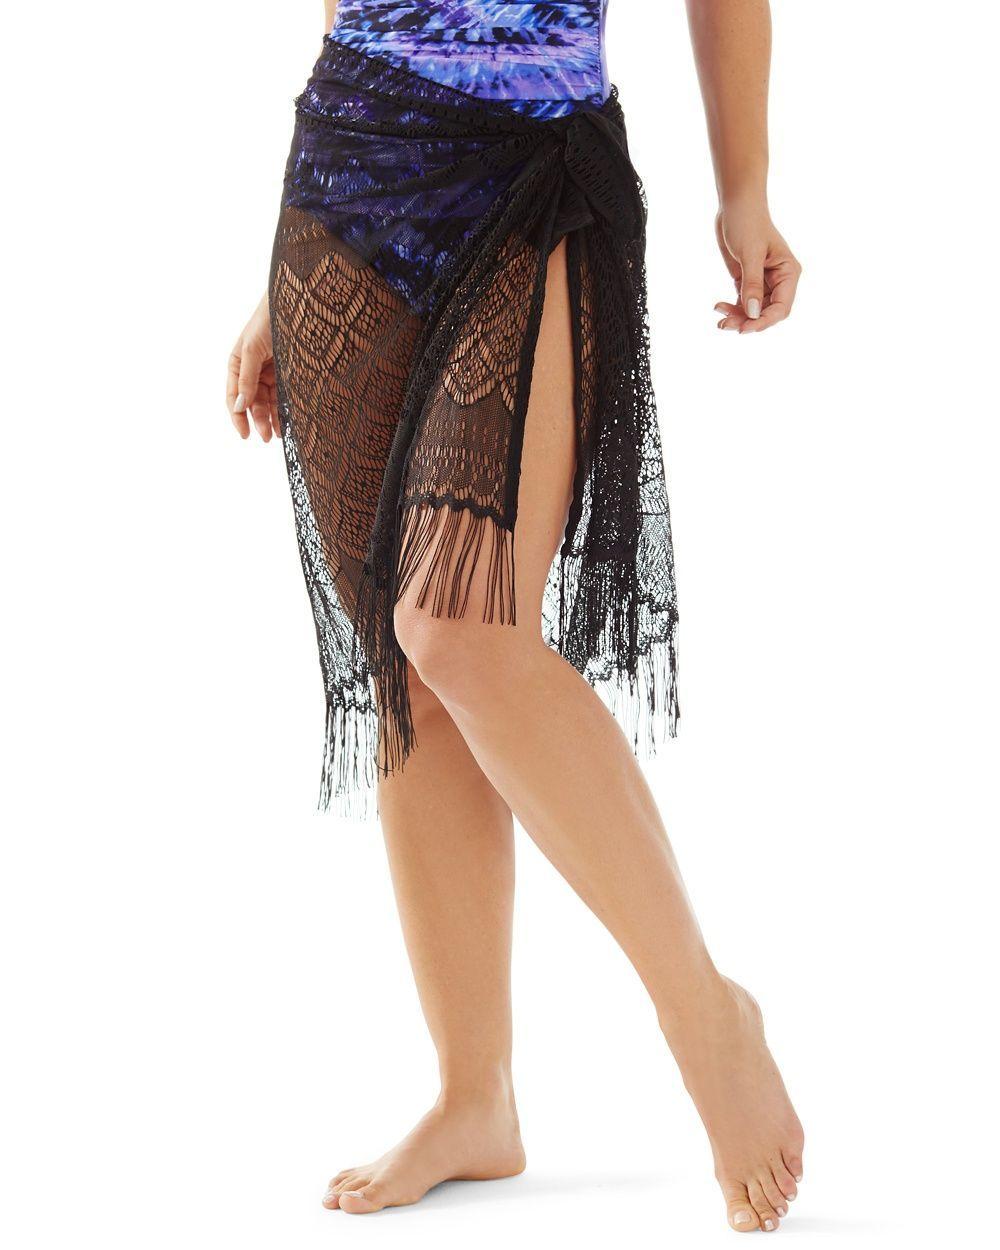 0bd385067e Chico's Women's Miraclesuit Fringe Sarong, Black, Size: One Size ...